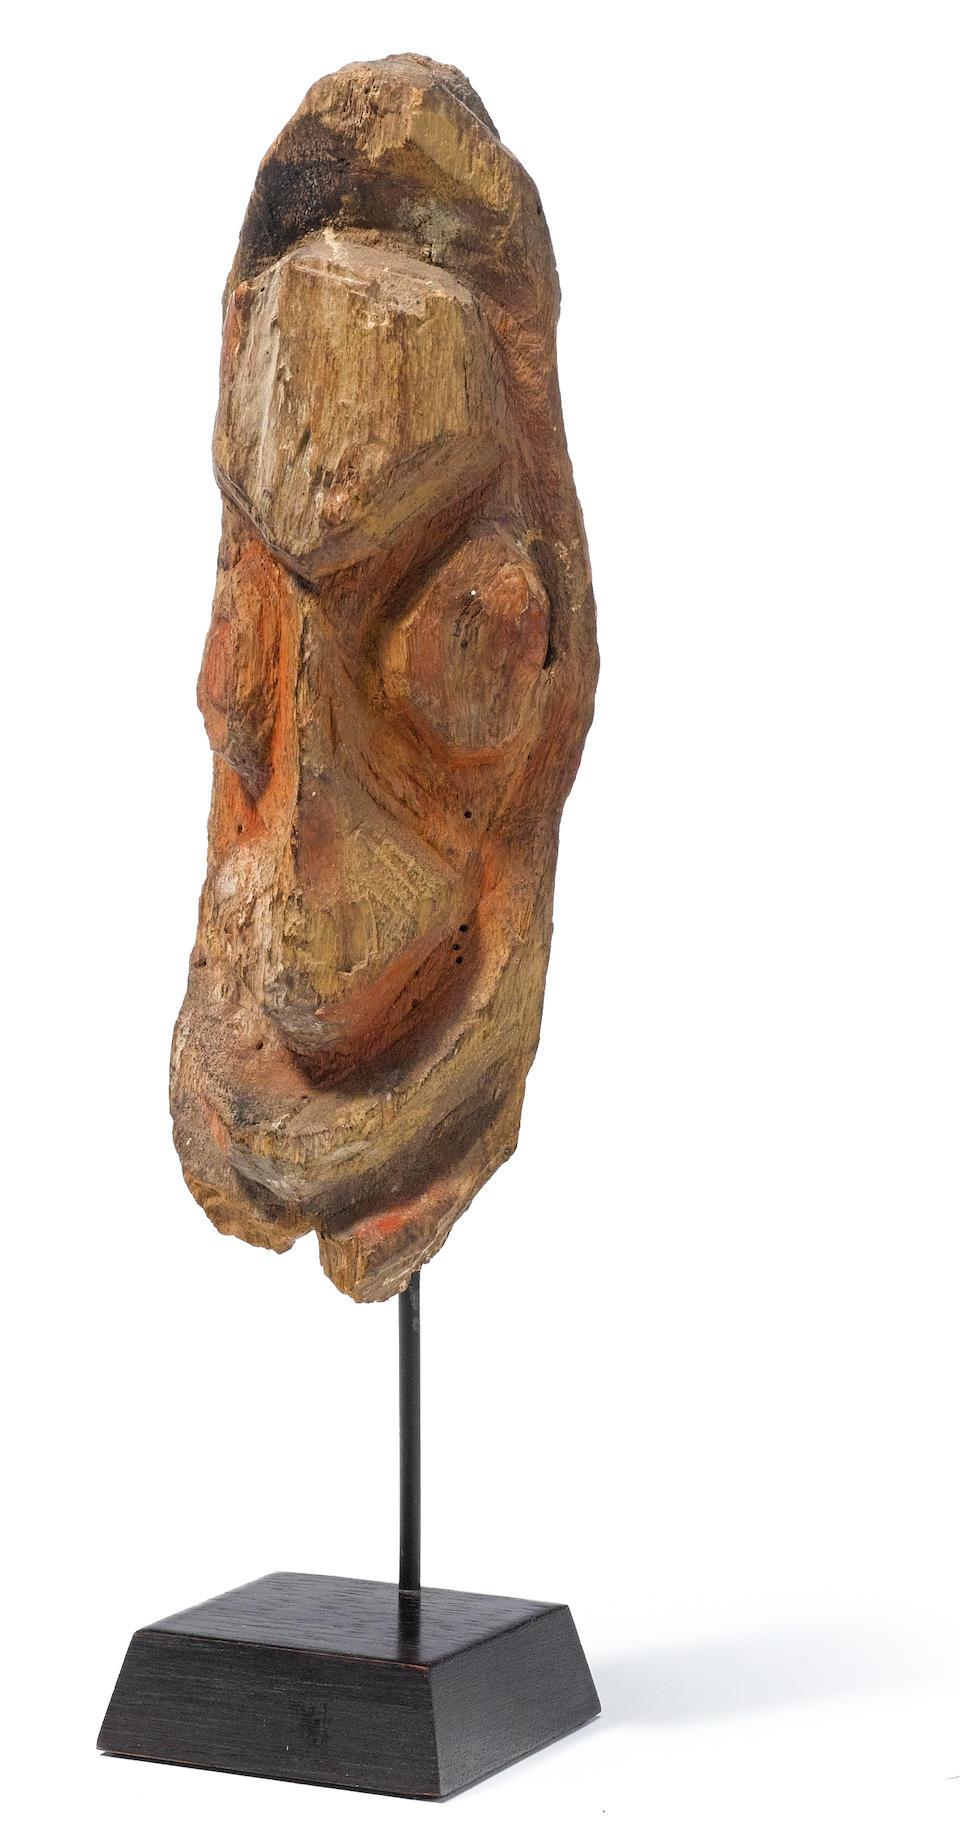 Ewa Fragment Head from an Aripa Figure, Karawari/Krosmeri River Area, Papua New Guinea